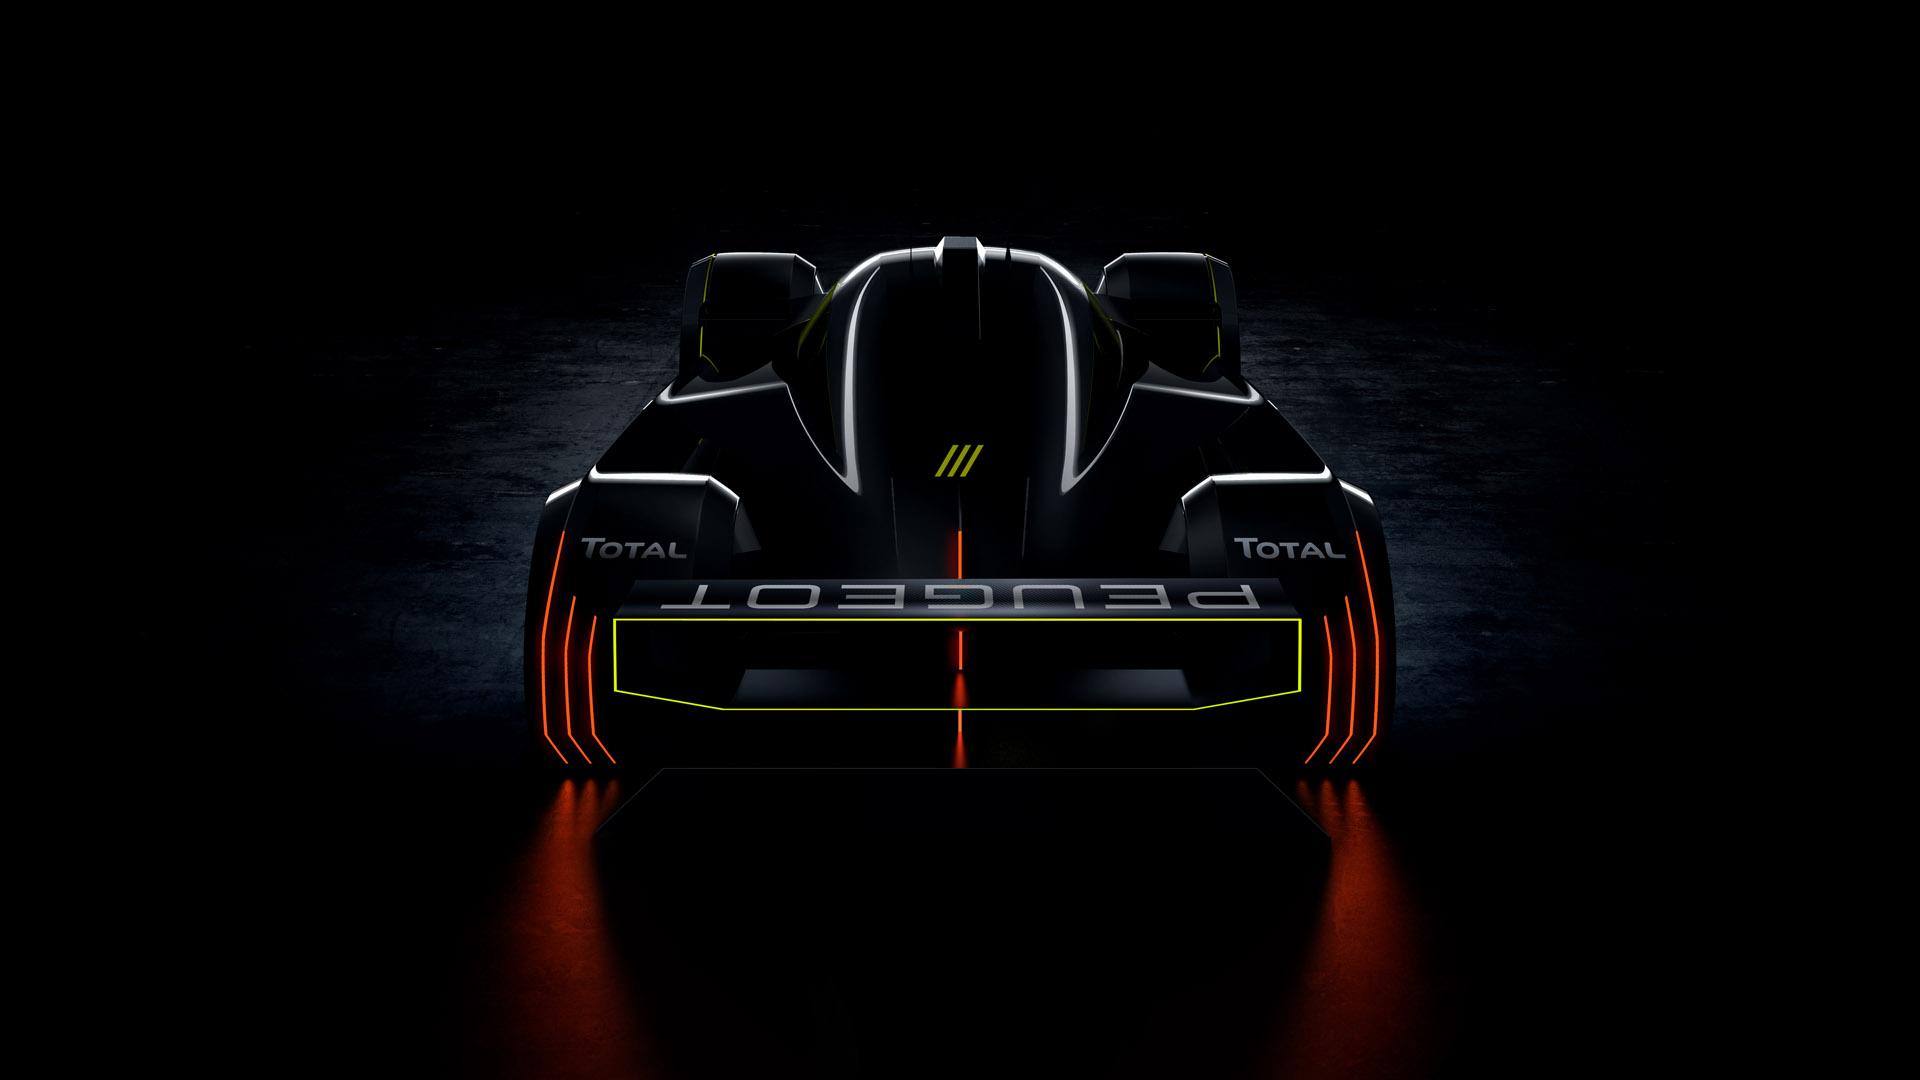 Peugeot Le Mans Hypercar back